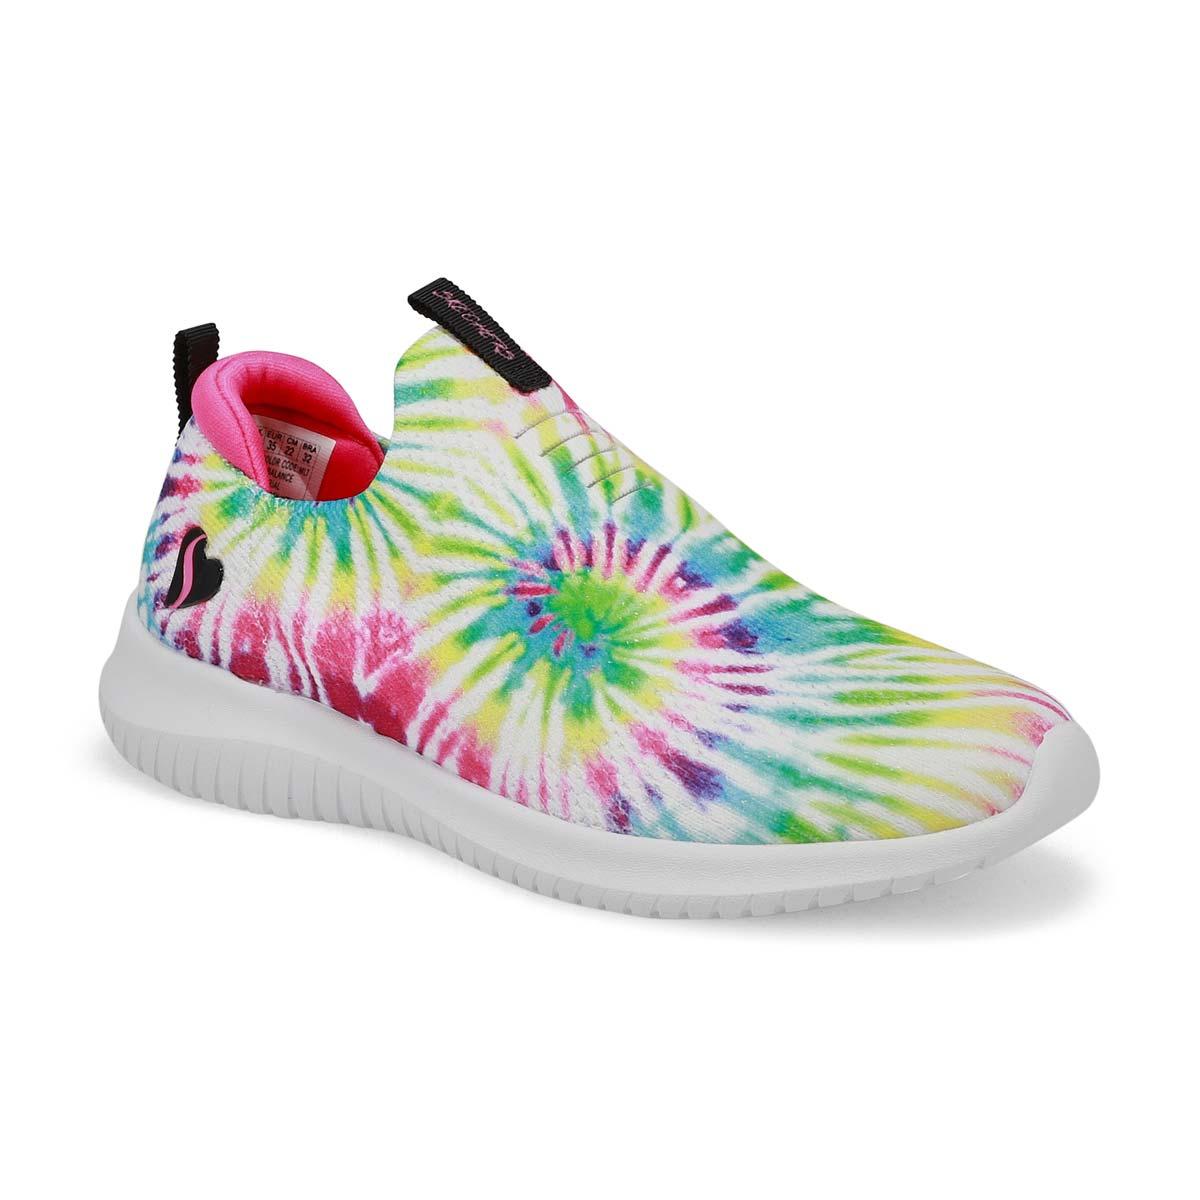 Girls' Ultra Flex Sneakers - Multi Coloured